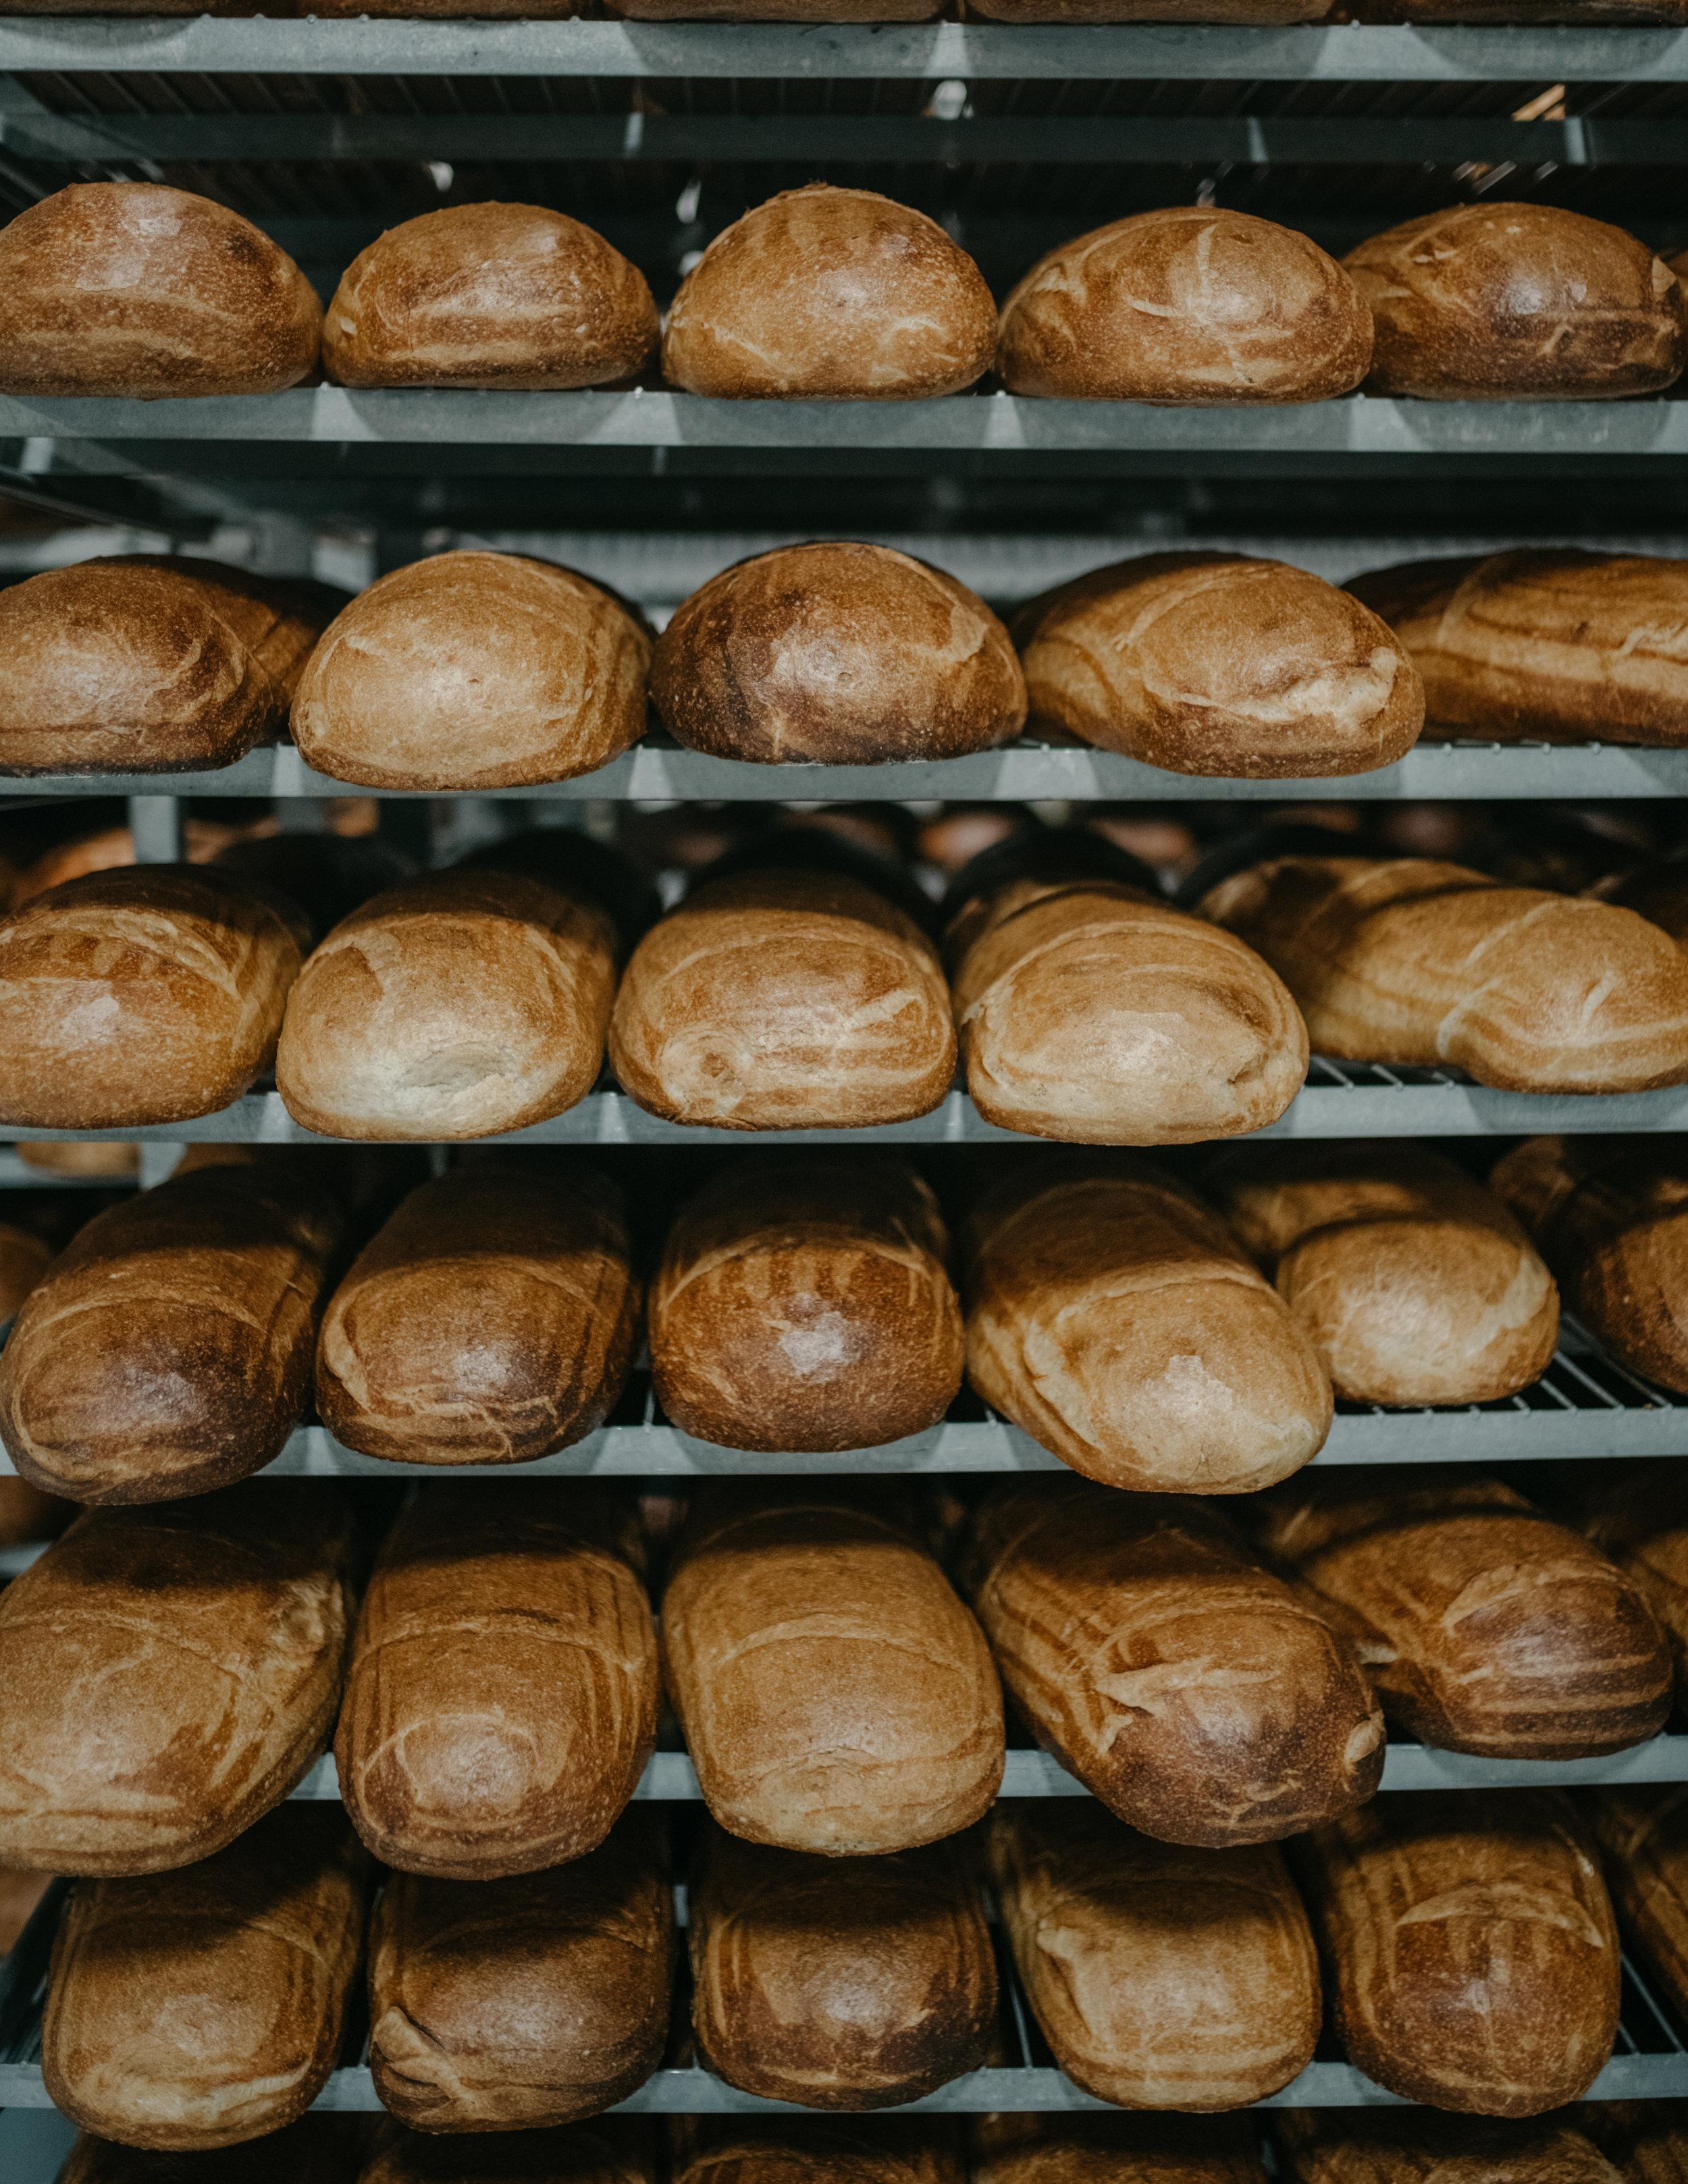 Bread_Alone-4.jpg